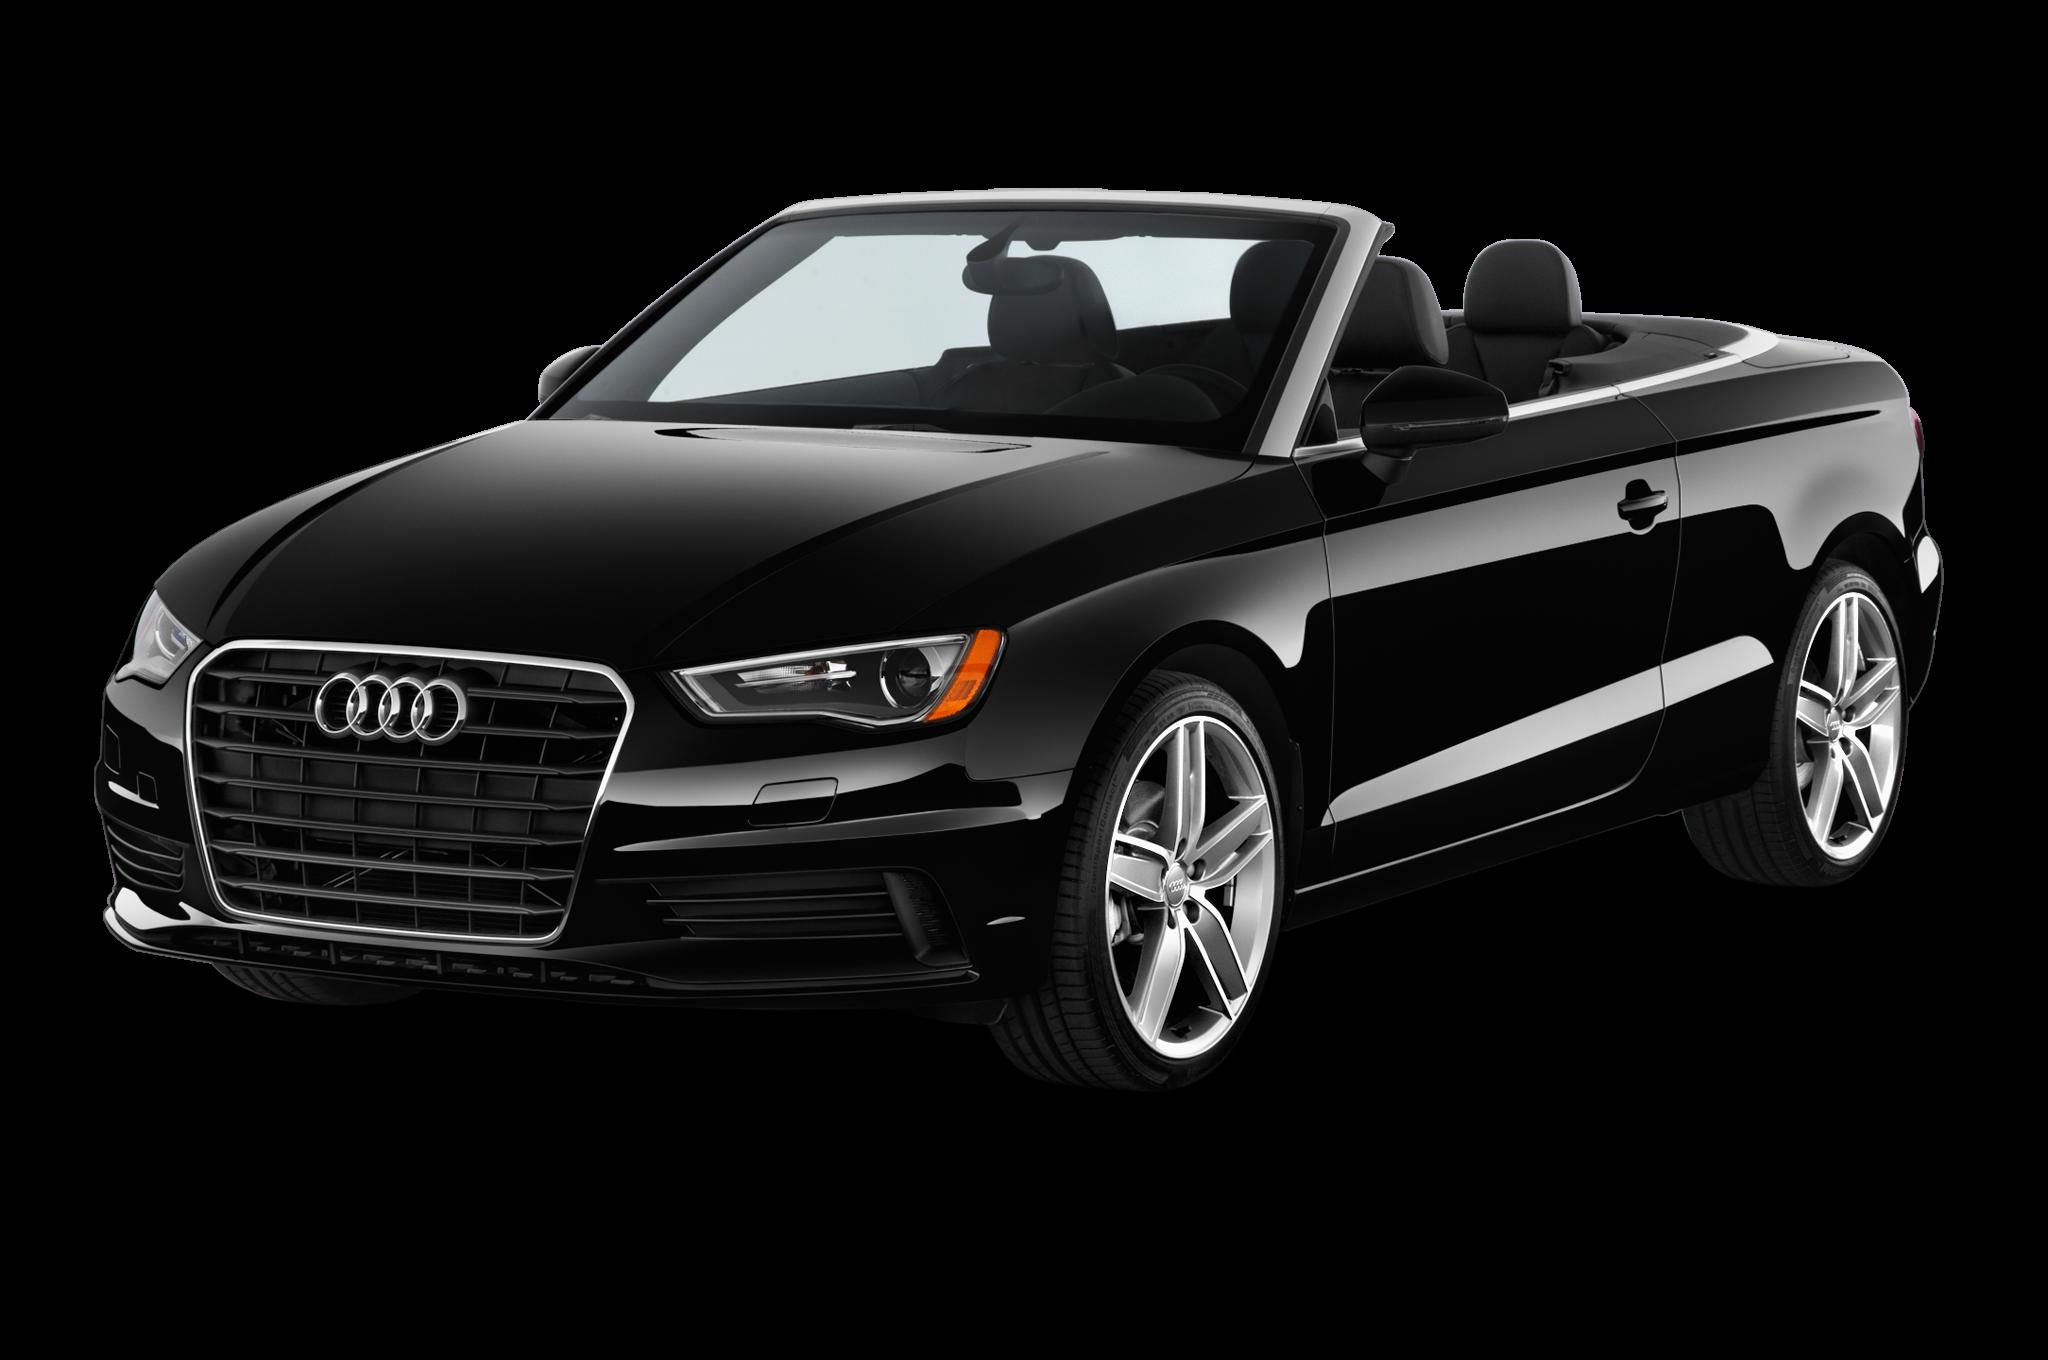 Audi A3 CABRIOLET 2016 FEATURES \u0026 SPECS